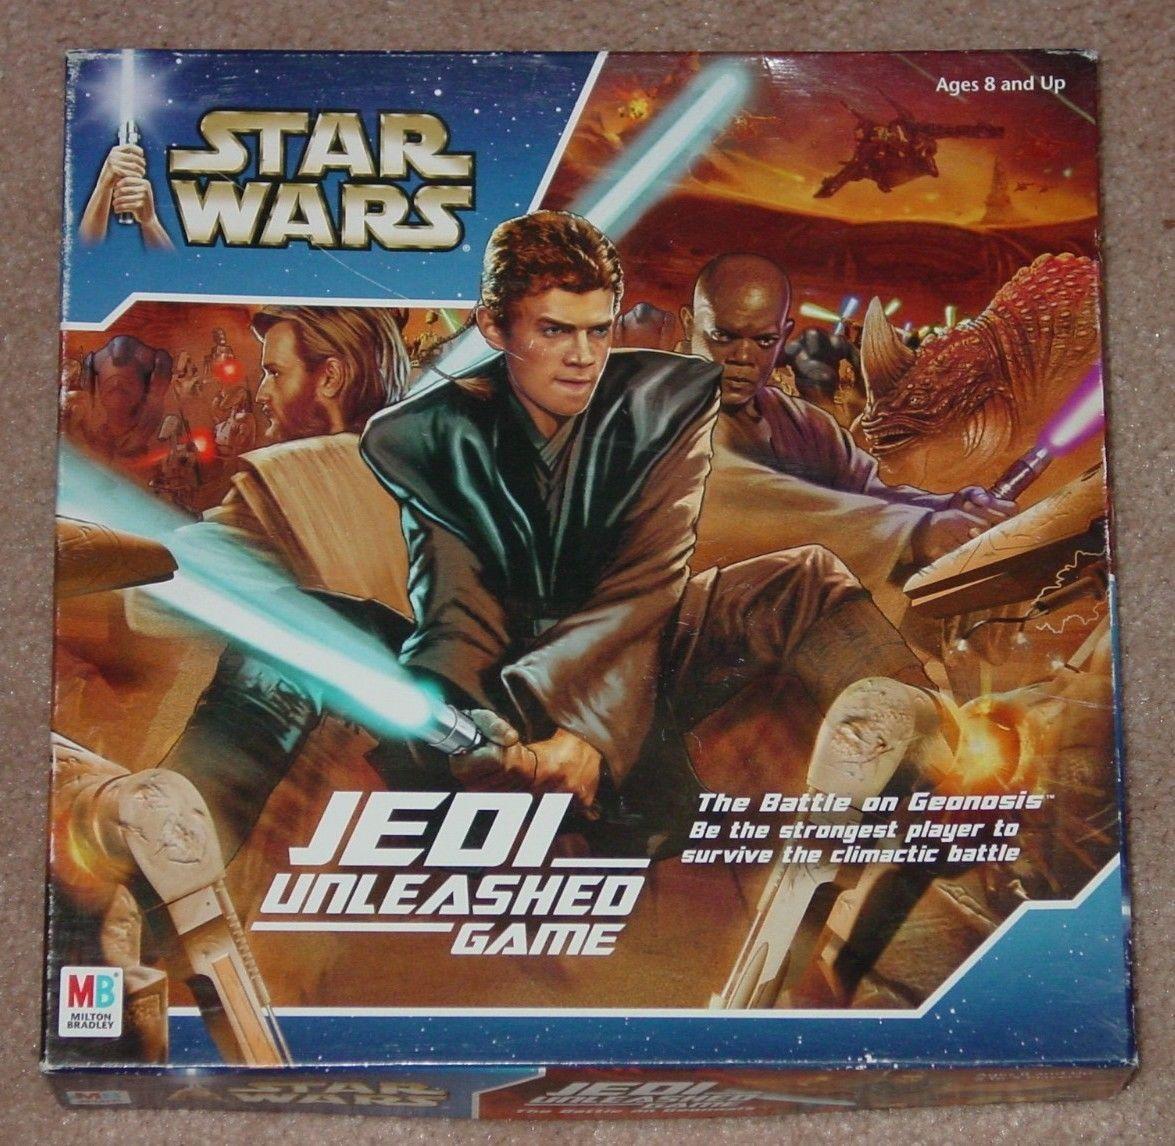 STAR WARS JEDI UNLEASED GAME 2002 MILTON BRADLEY HASBRO COMPLETE EXCELLENT - $20.00